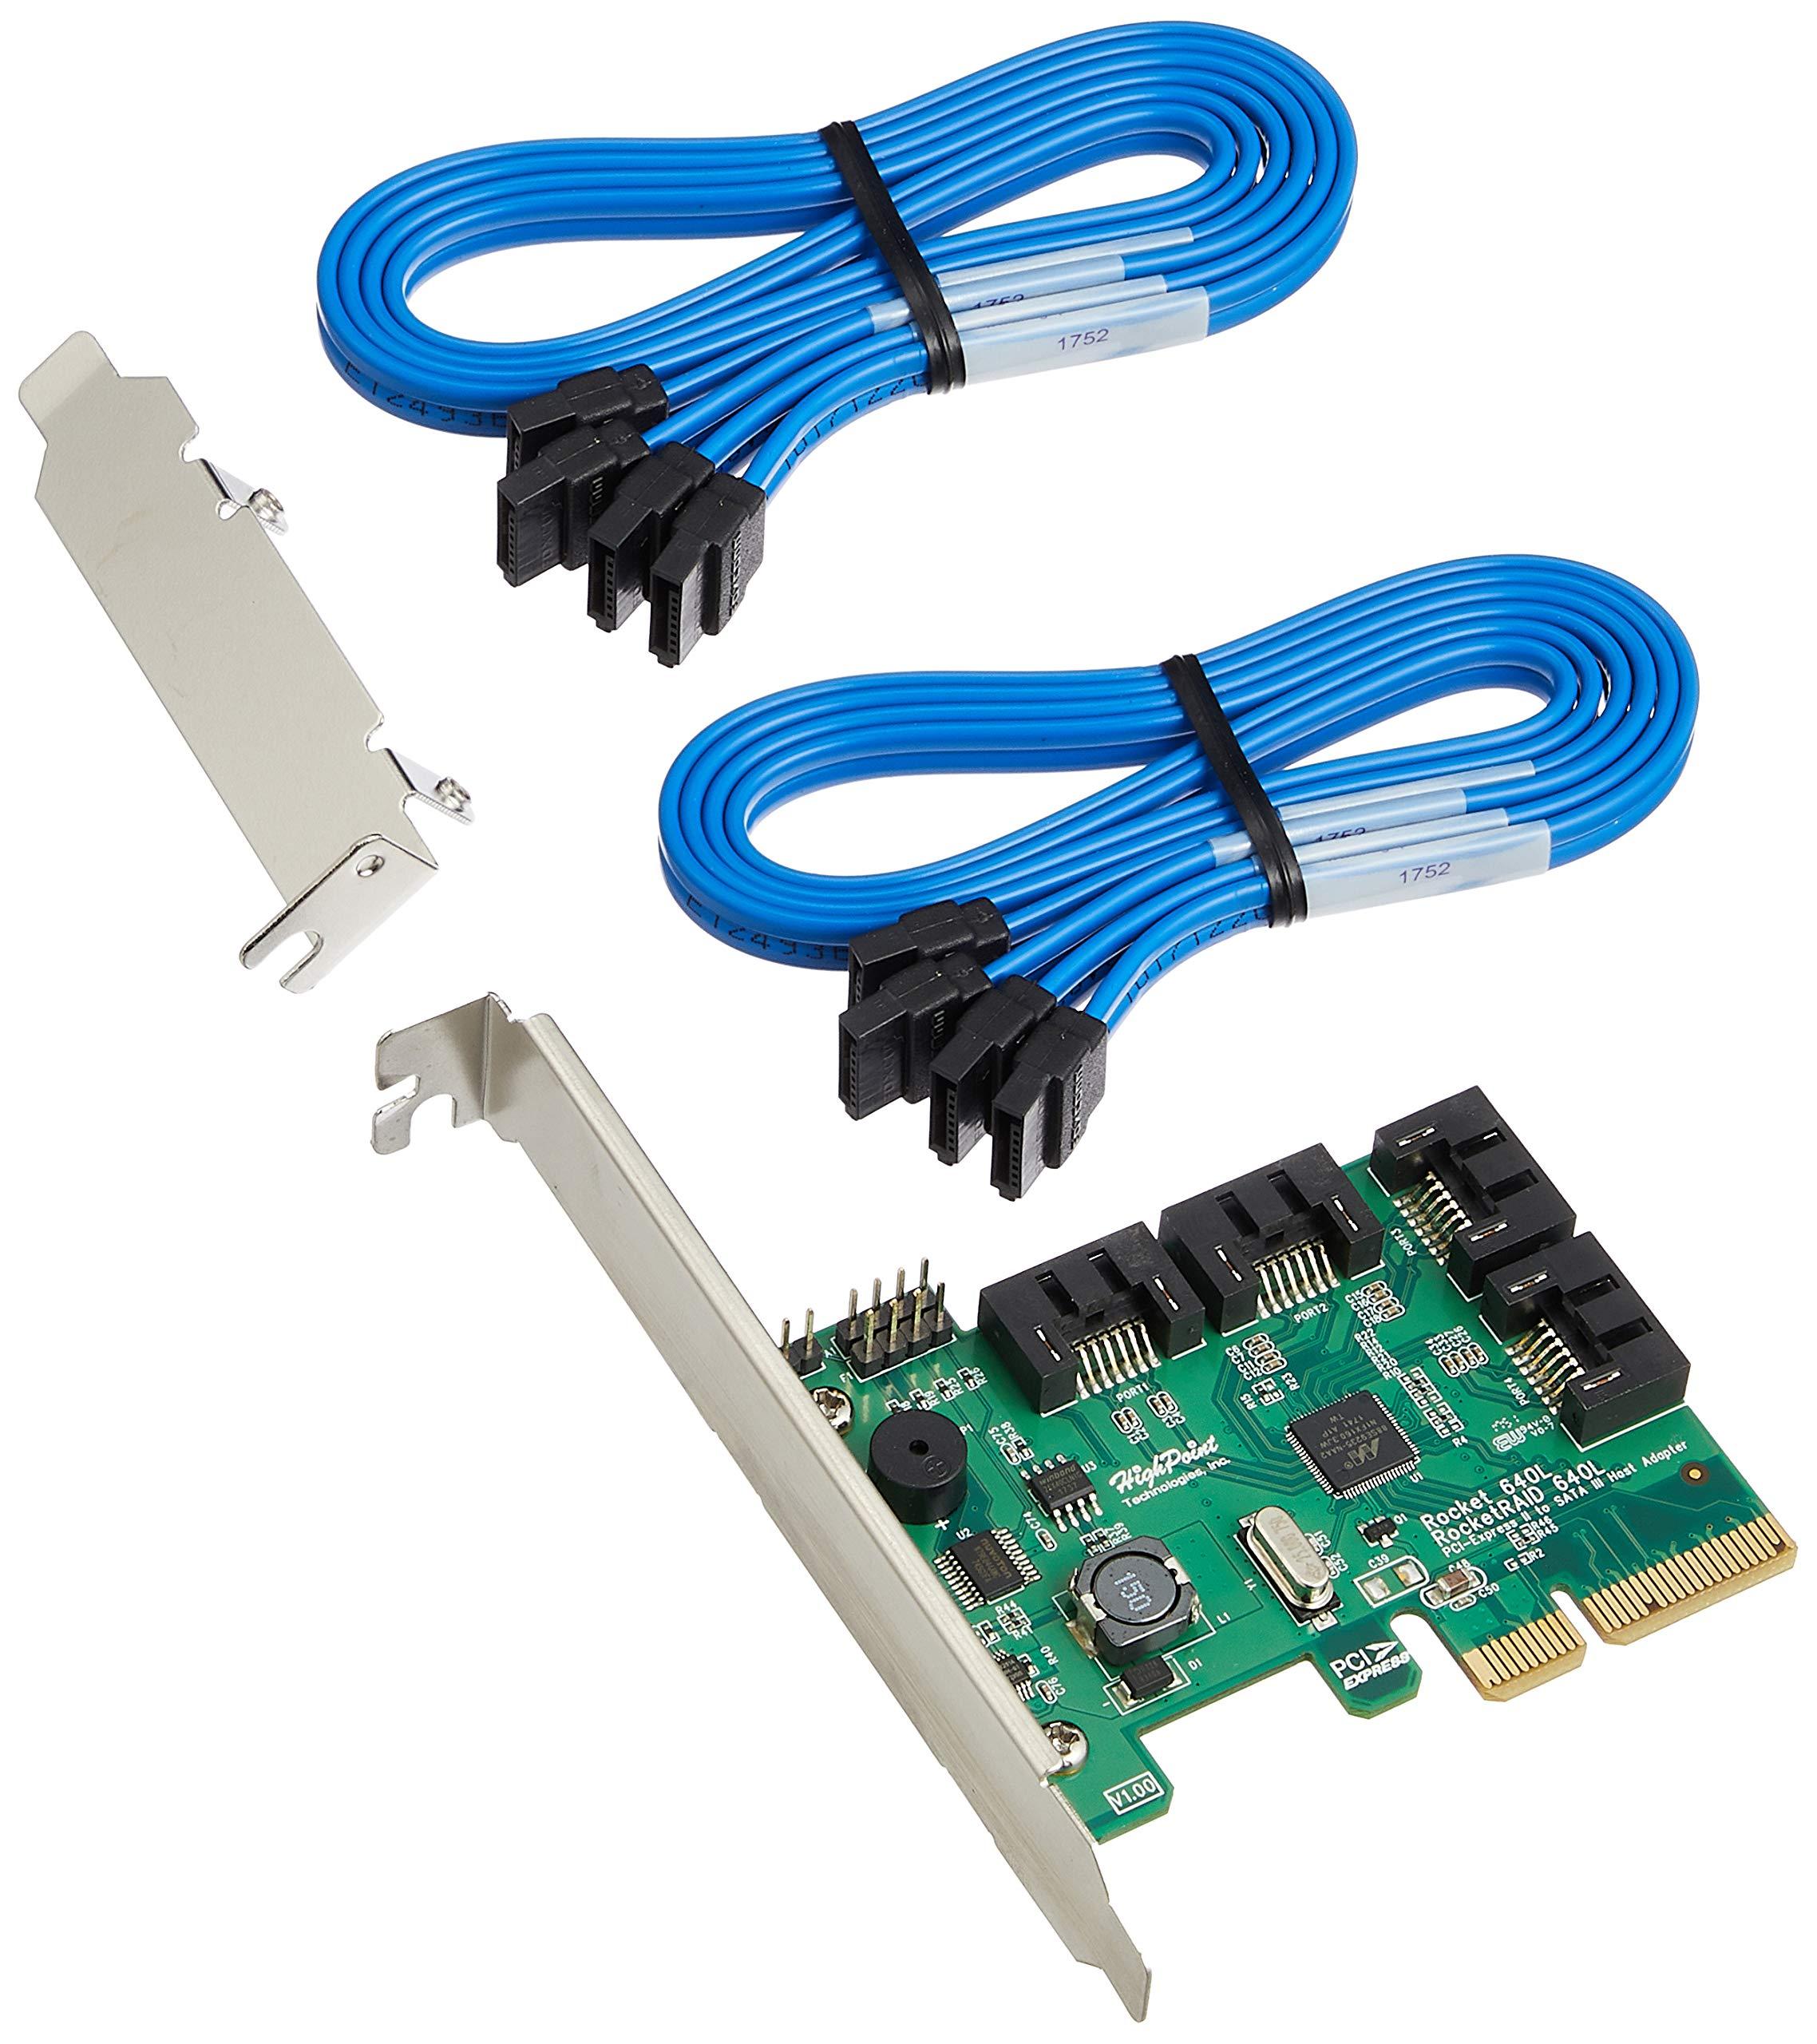 High Point RocketRAID 640L Internal 4 SATA Port PCI-Express